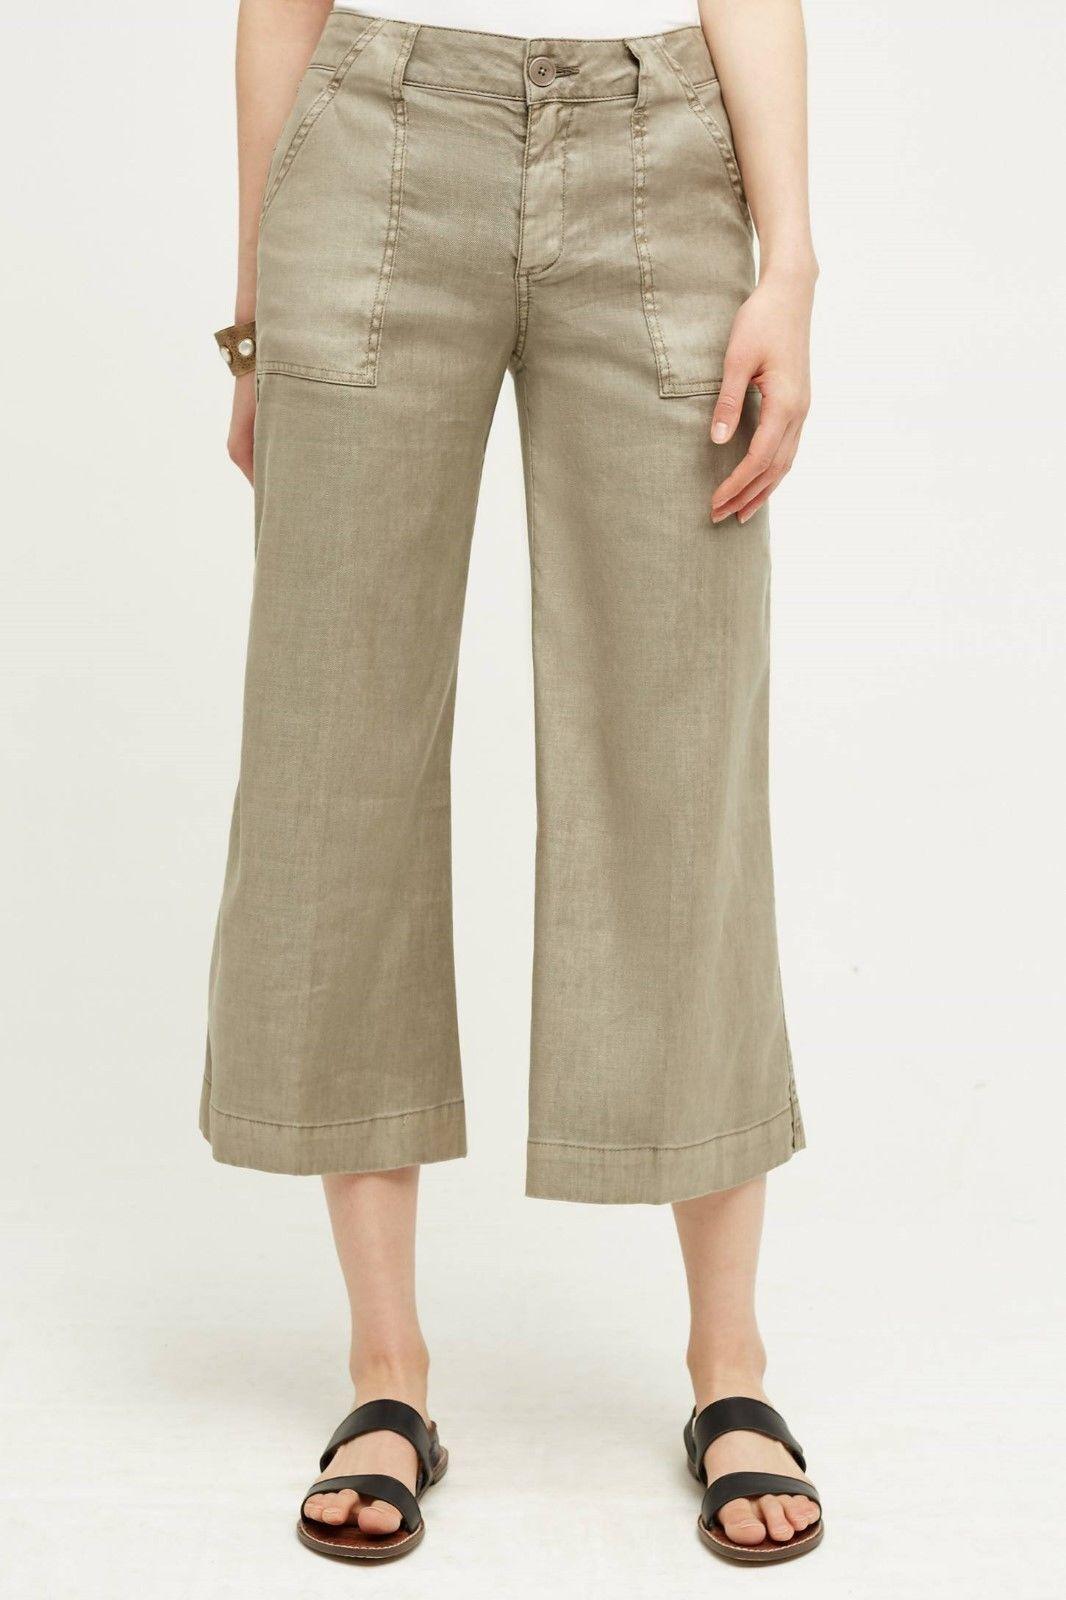 Anthropologie Level 99 Linen WIDE-LEGS GAUCHOS PANTS Size 26,27 NwT